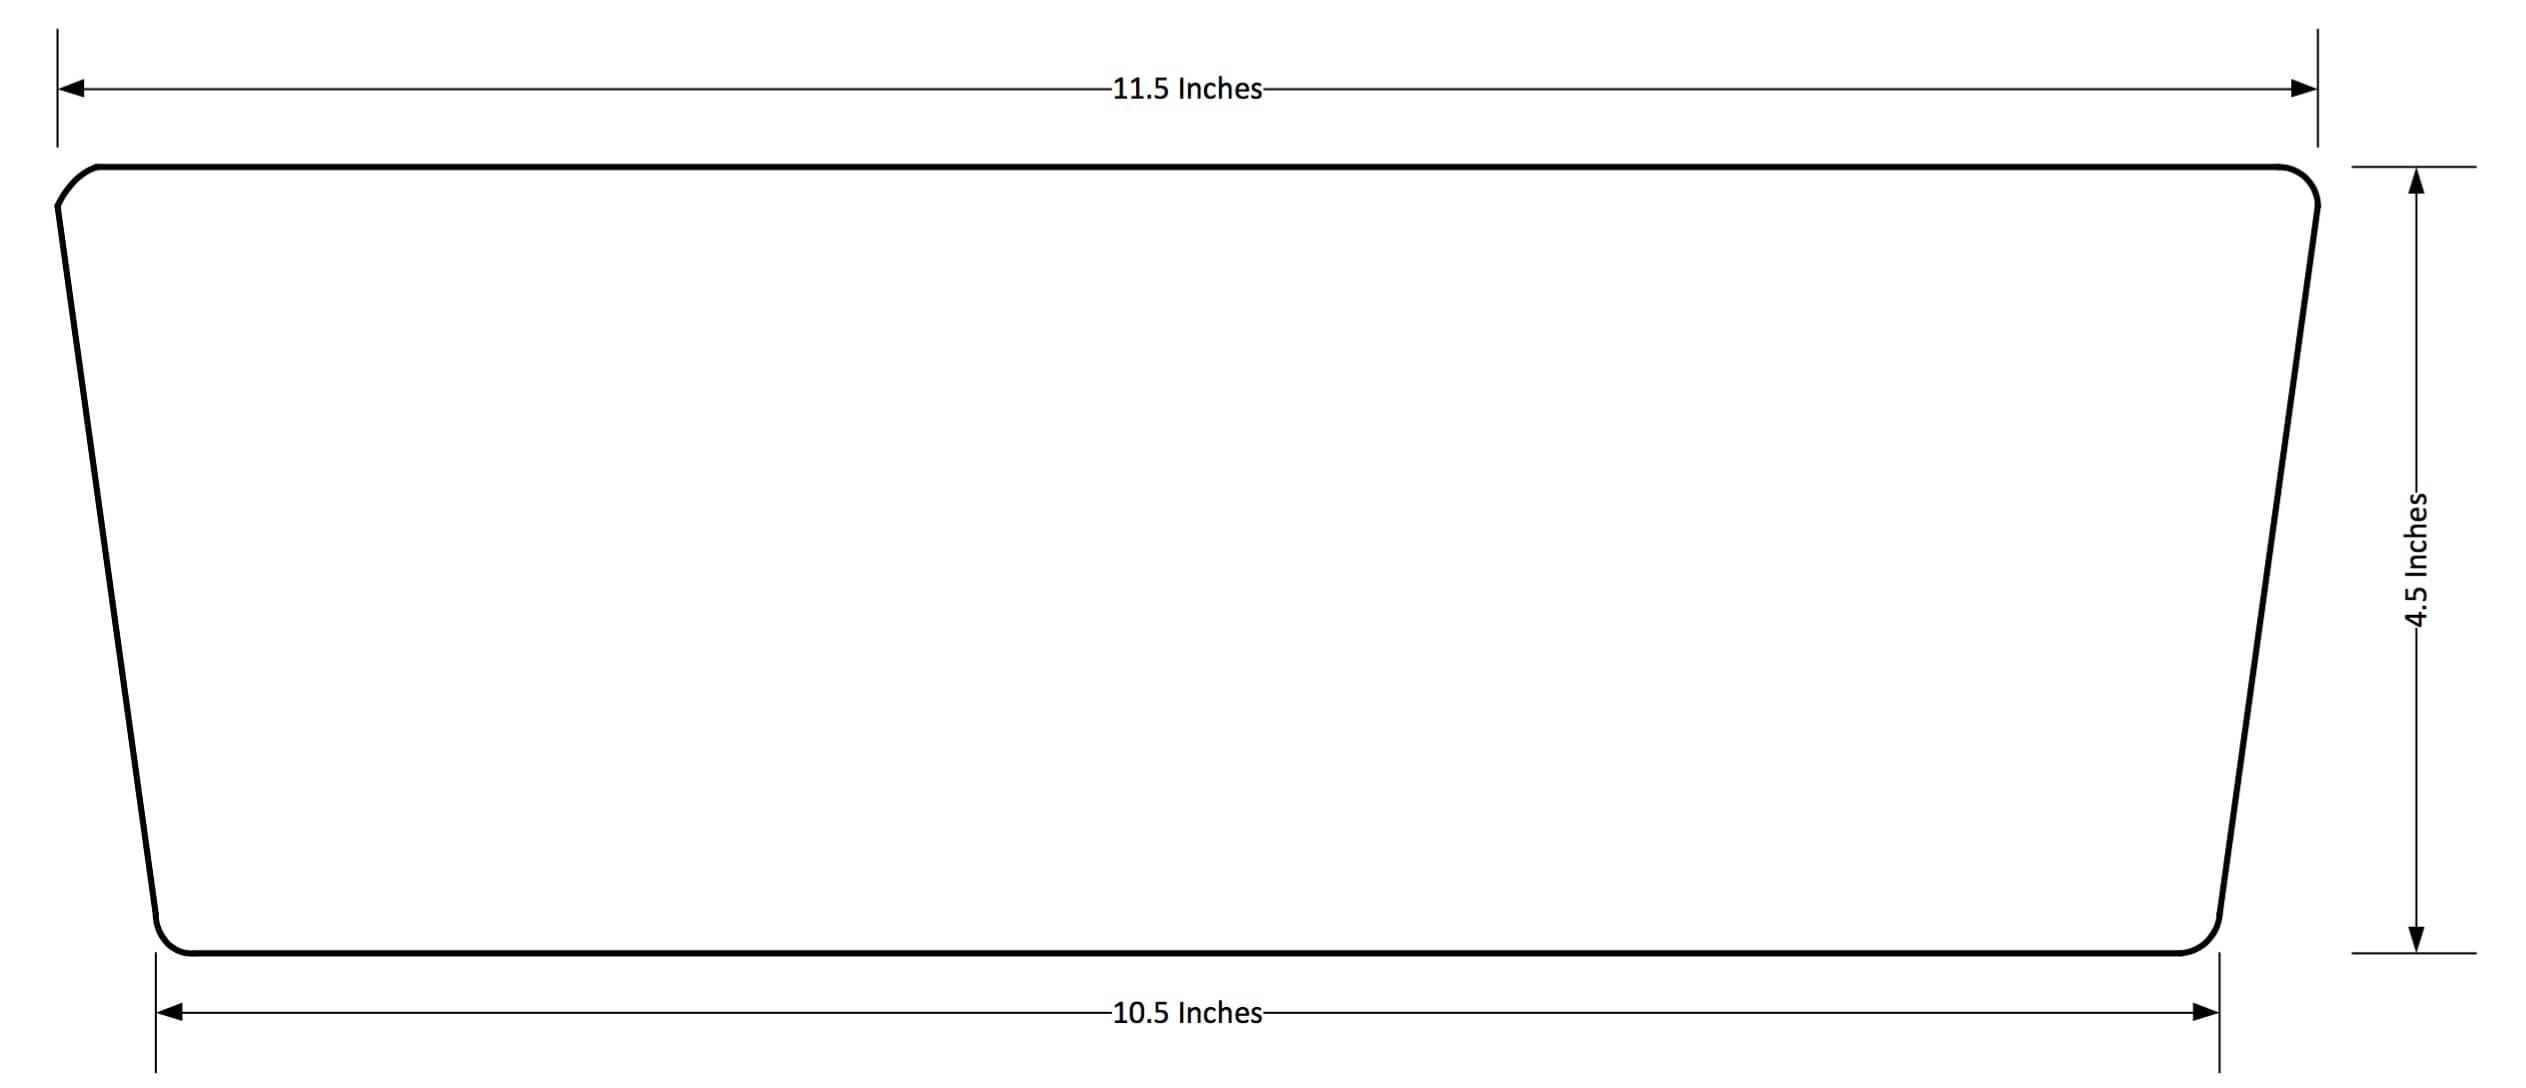 trapezoid shape and slightly rounded corners